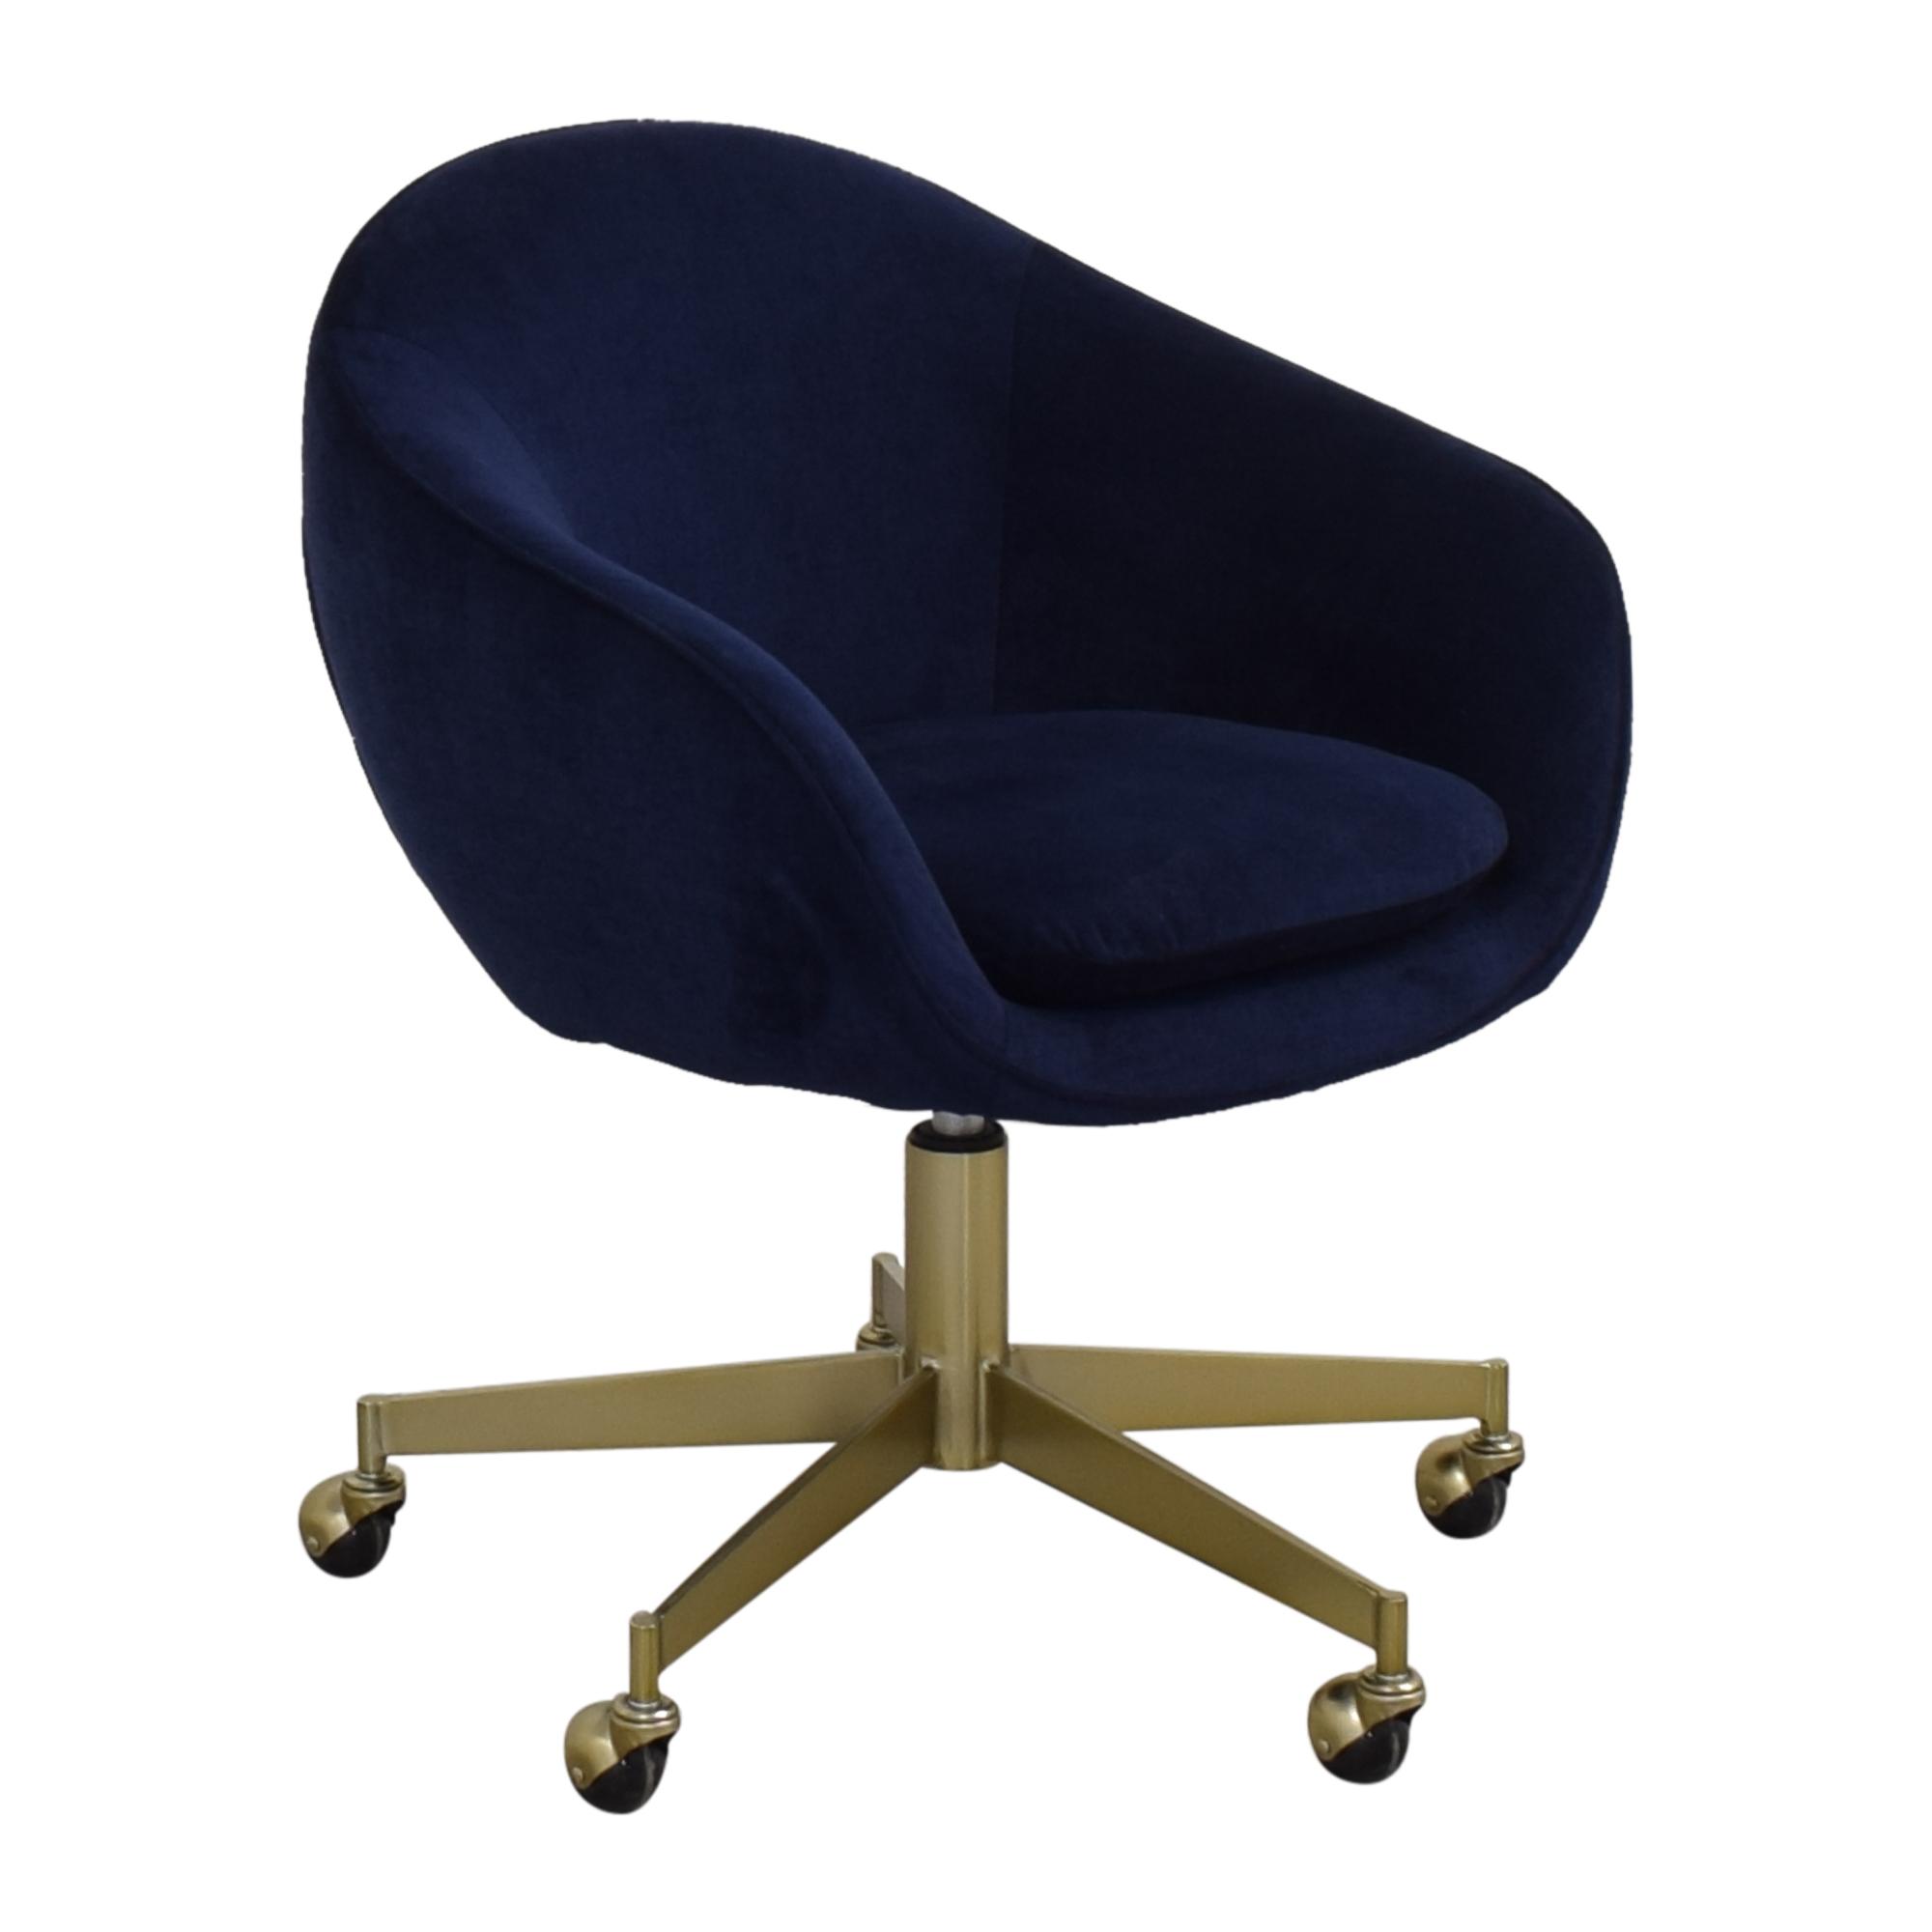 West Elm West Elm Alys Swivel Office Chair second hand